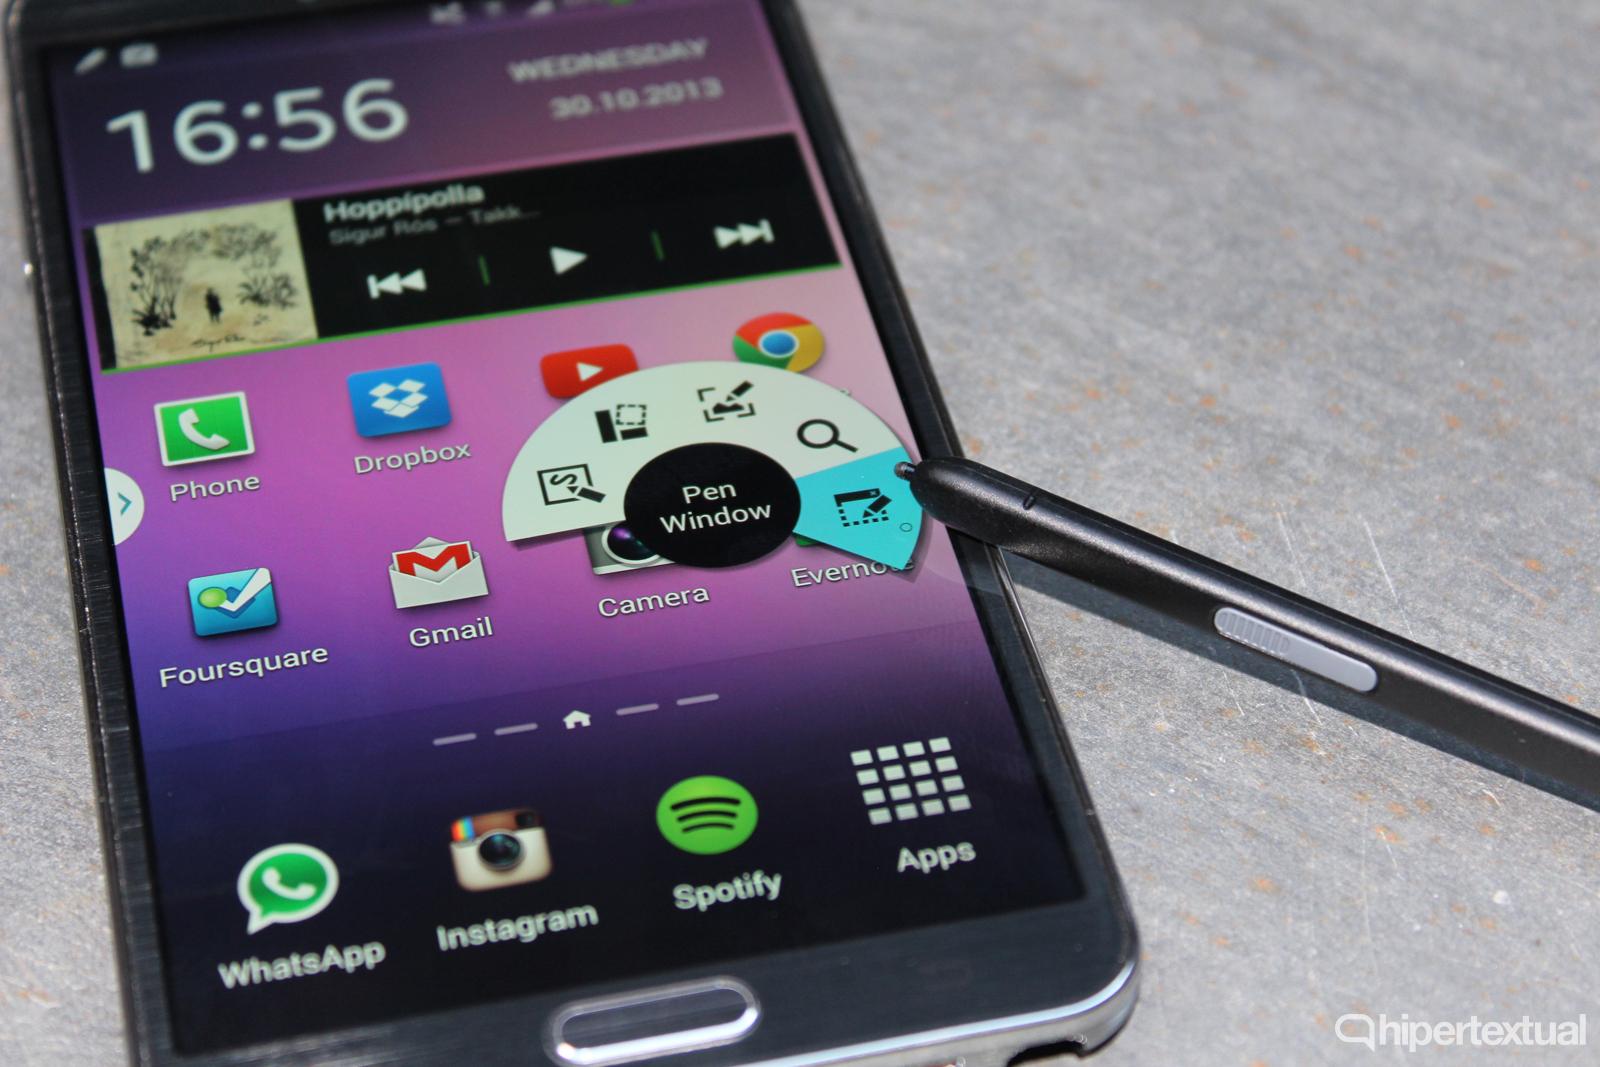 Samsung Galaxy Note 3 - Samsung Galaxy Note 3 - Samsung Galaxy Note 3